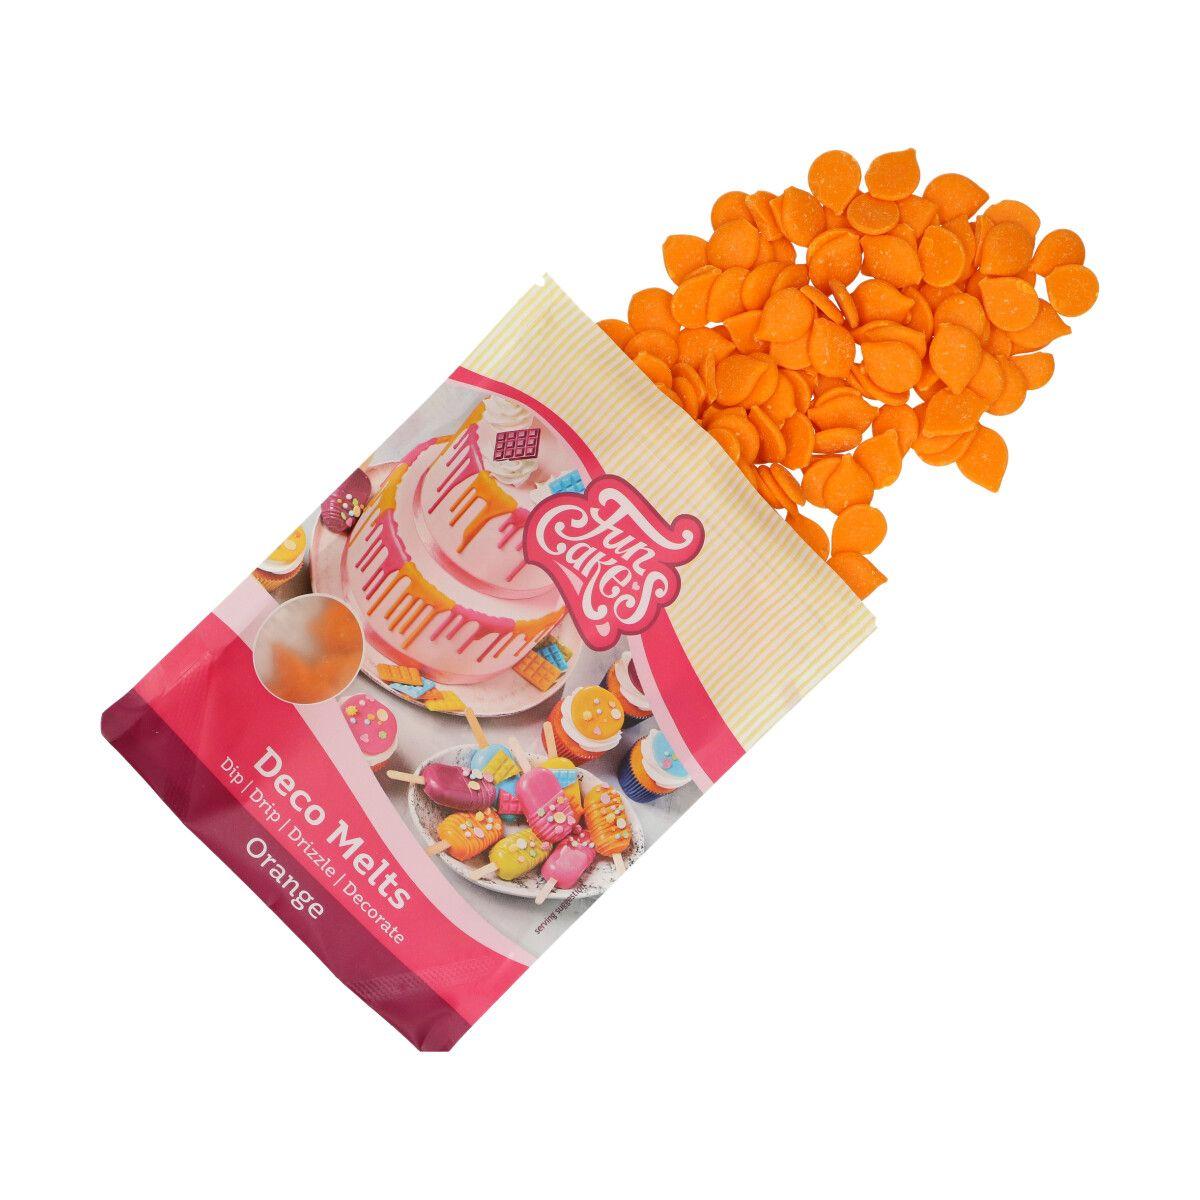 Deco Melts orange